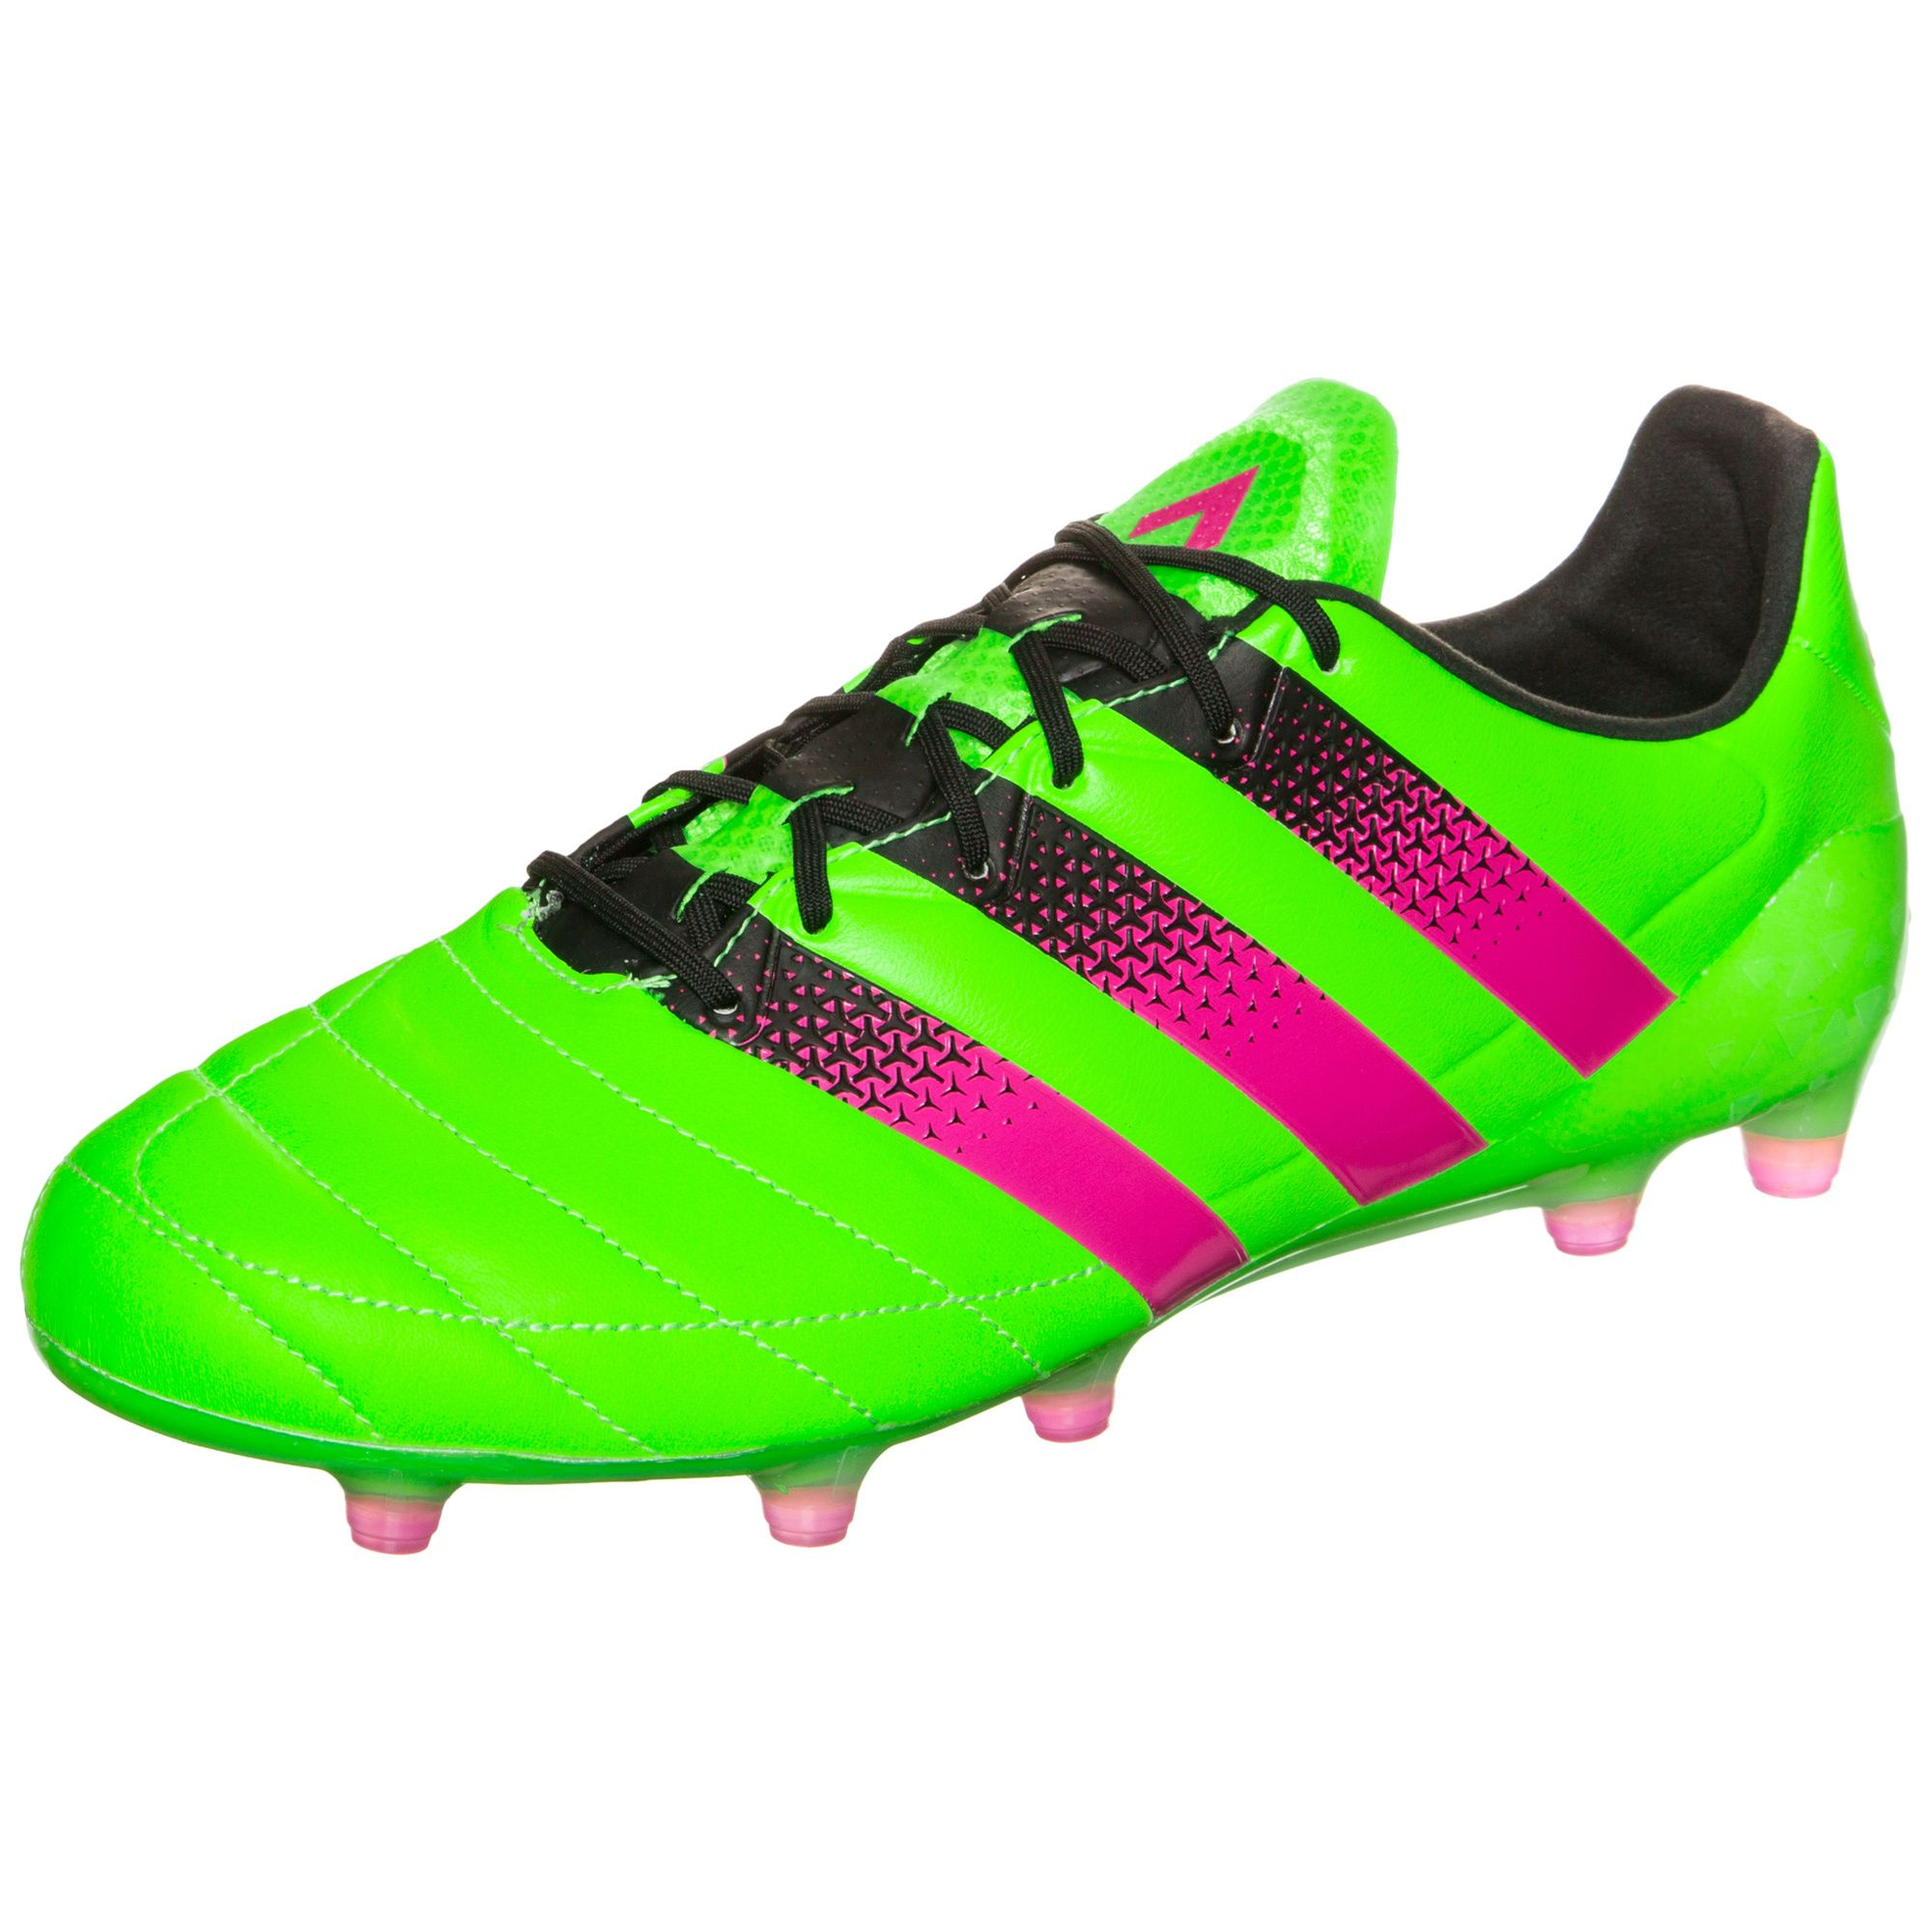 ADIDAS PERFORMANCE adidas Performance ACE 16.1 FG/AG Leather Fußballschuh Herren